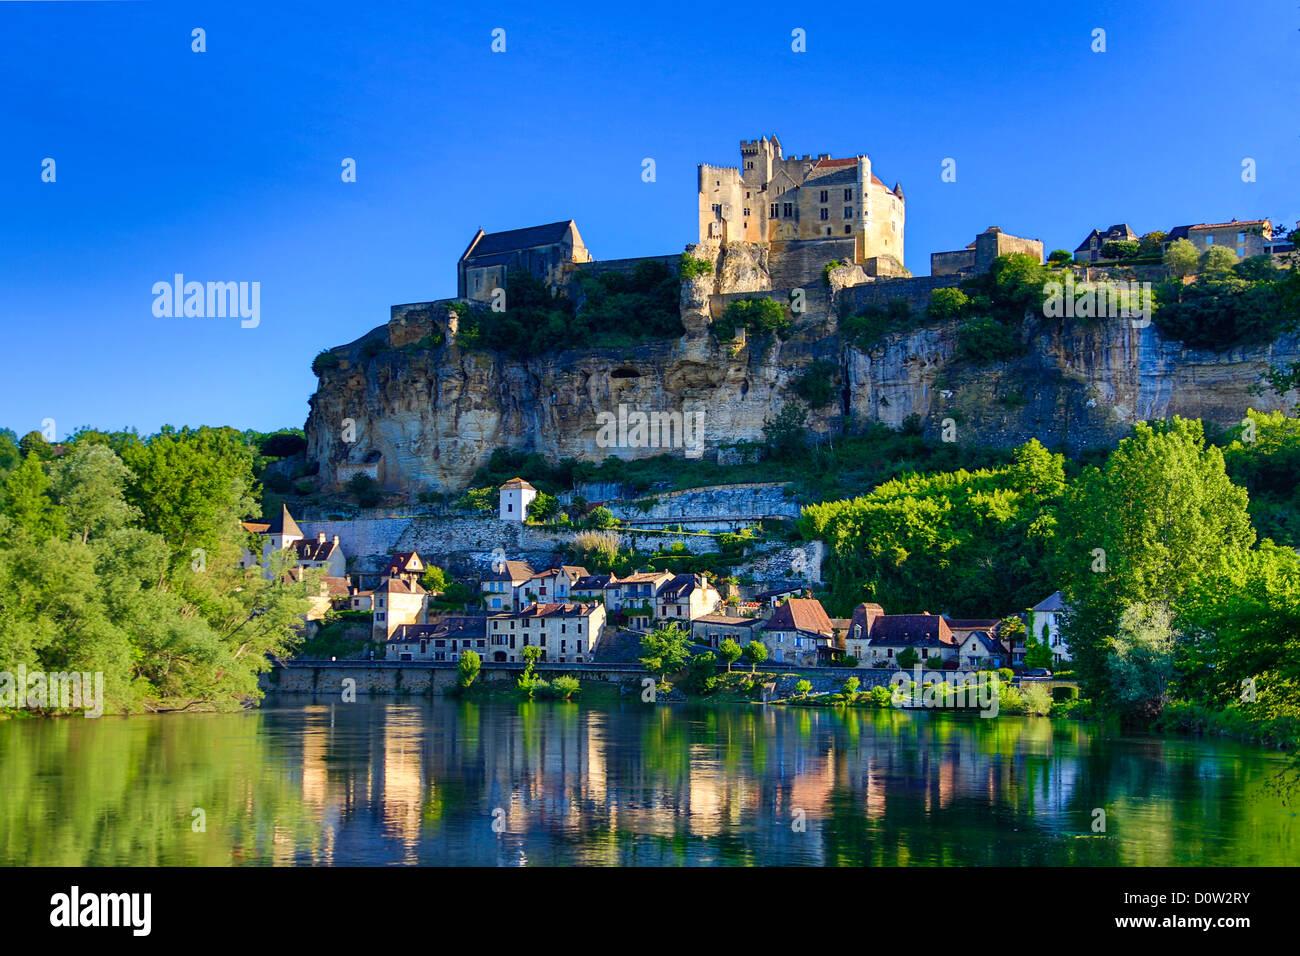 France, Europe, travel, Dordogne, Beynac, architecture, castle, landscape, medieval, morning, river, skyline, steep, - Stock Image